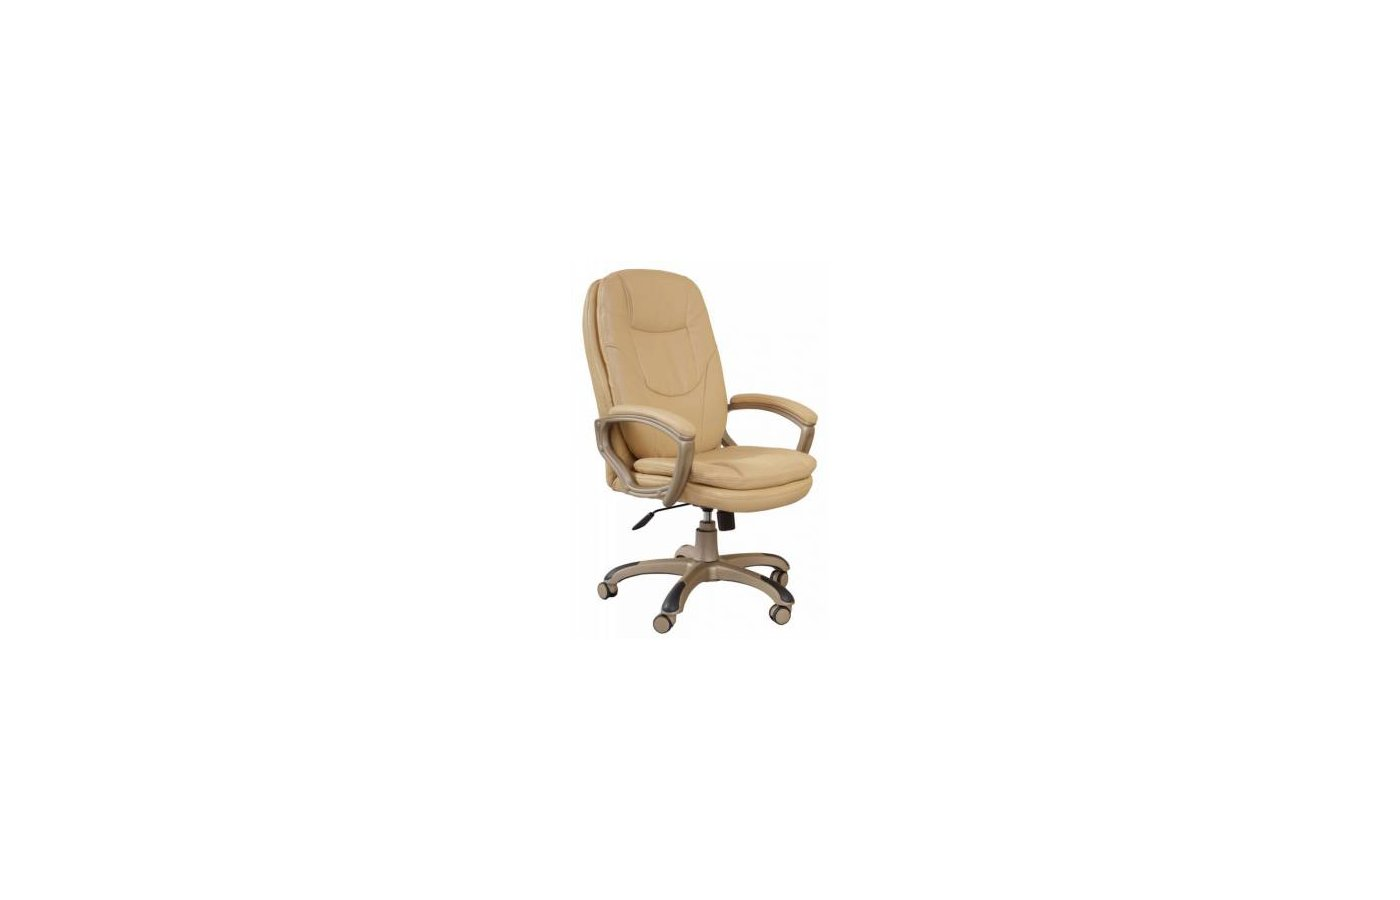 Бюрократ CH-868YAXSN/Beige бежевый искусственная кожа (пластик золото)